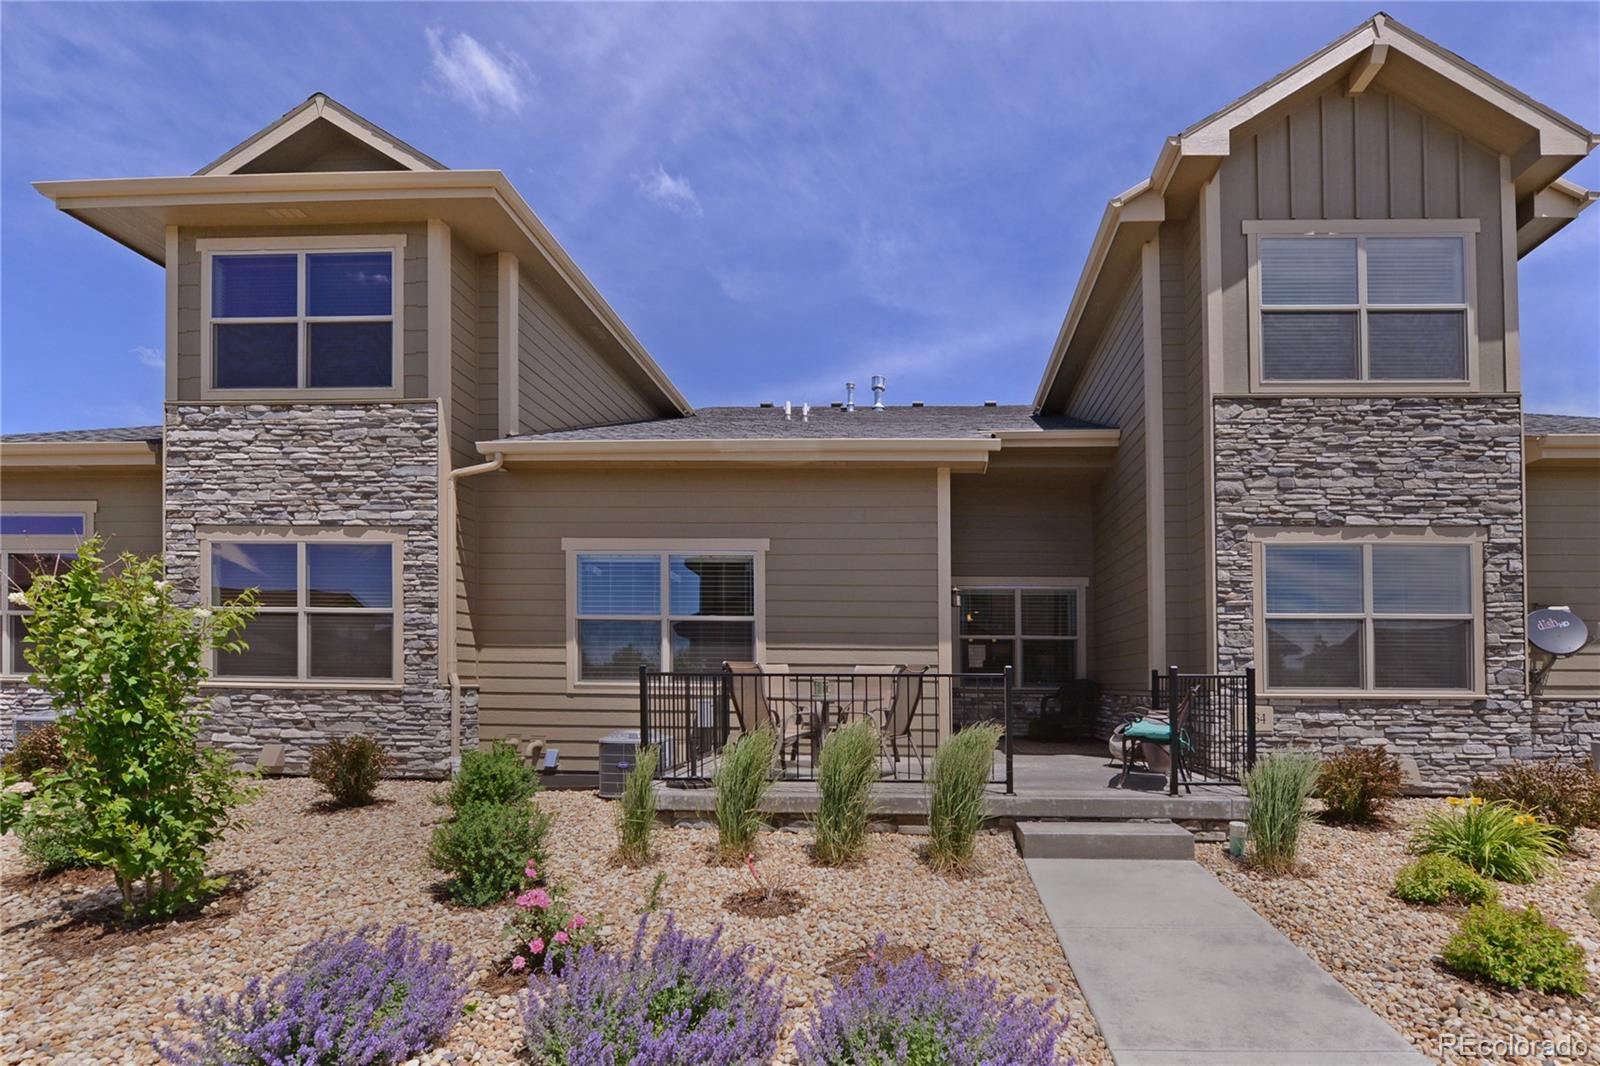 1964 Pikes Peak Drive #40 Property Photo - Loveland, CO real estate listing